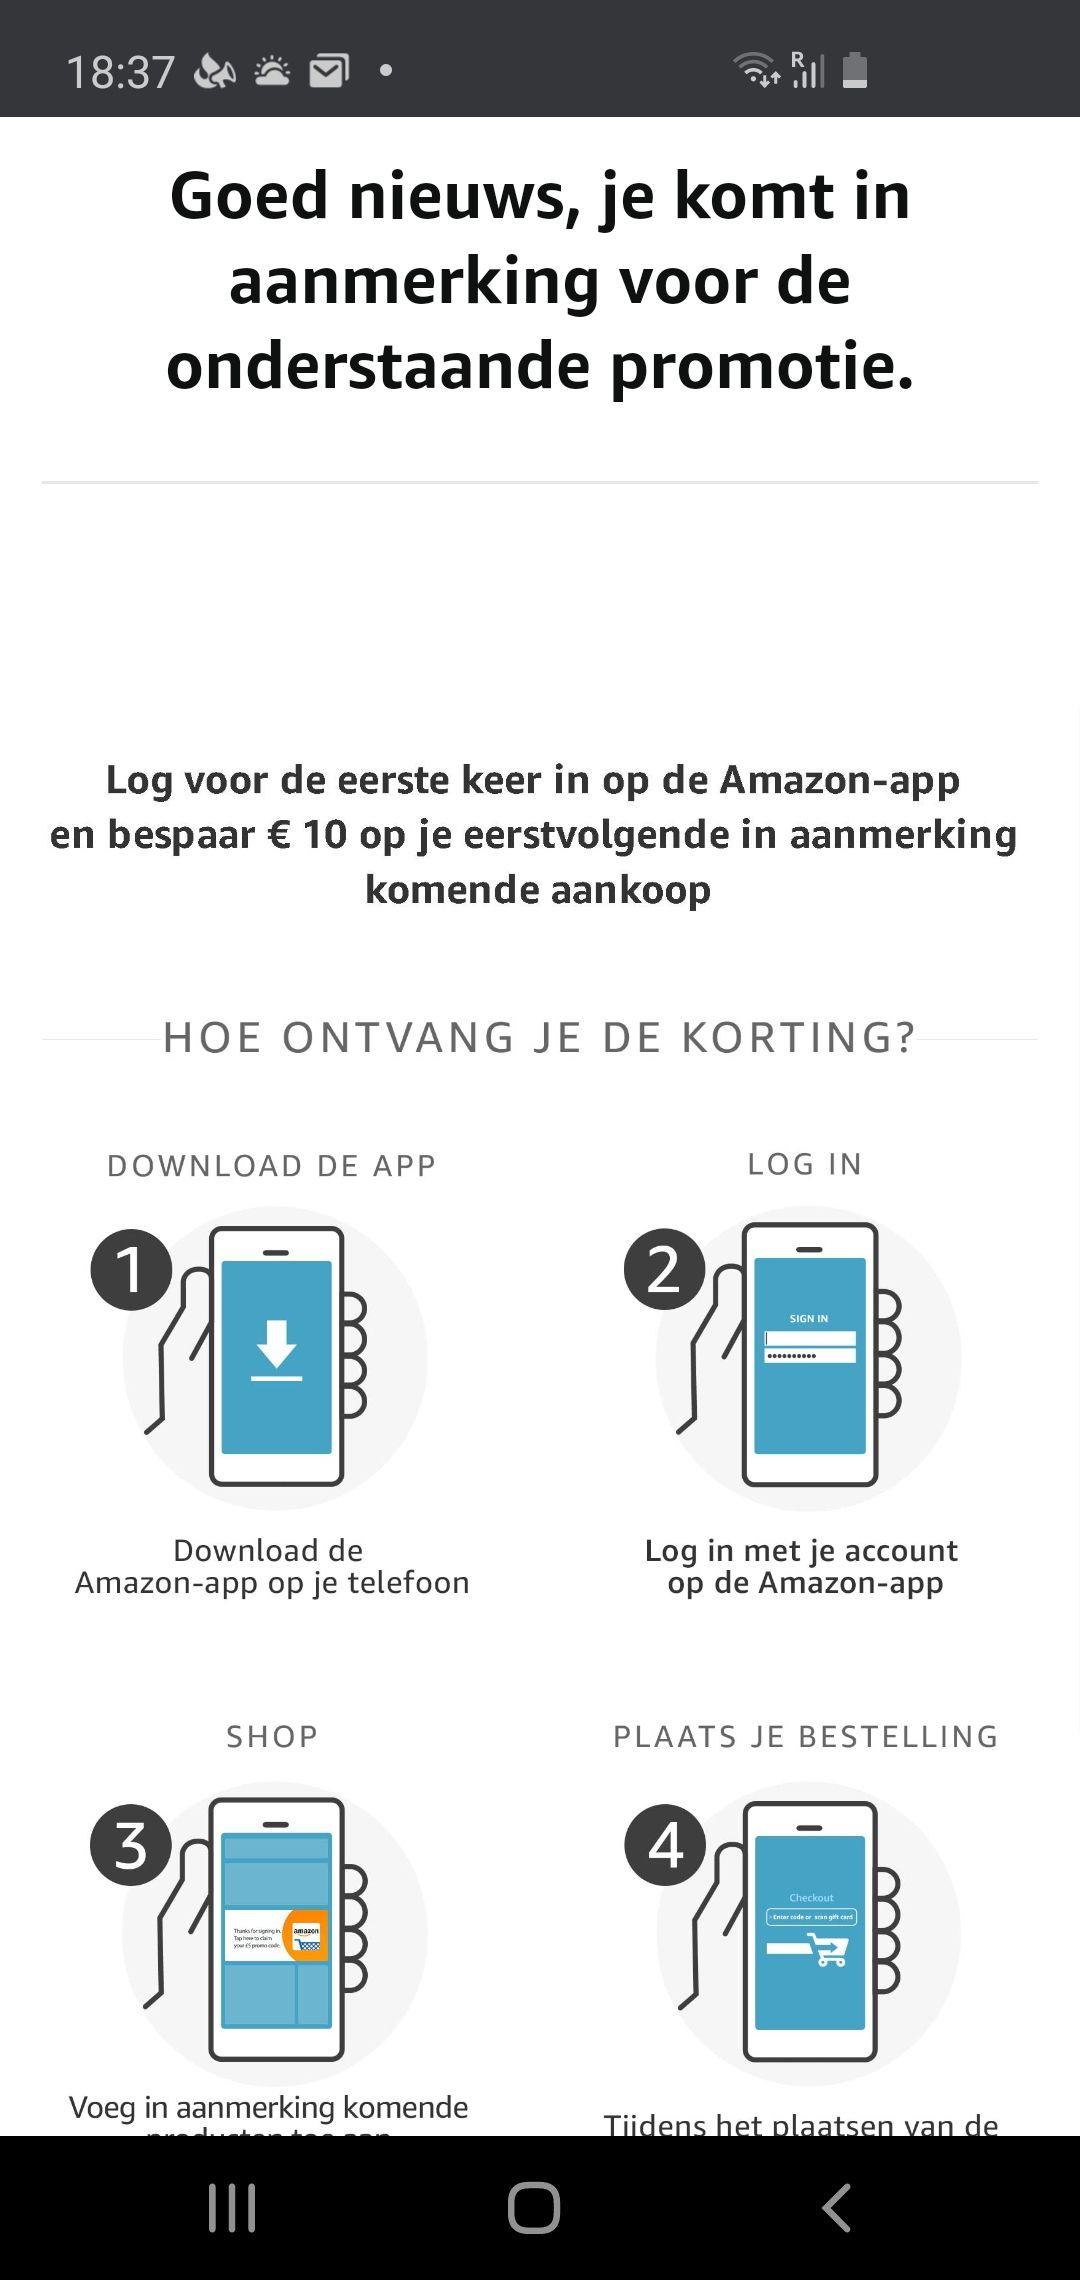 10 euro korting amazon.nl bij besteding 30 euro ff beschrijving lezen